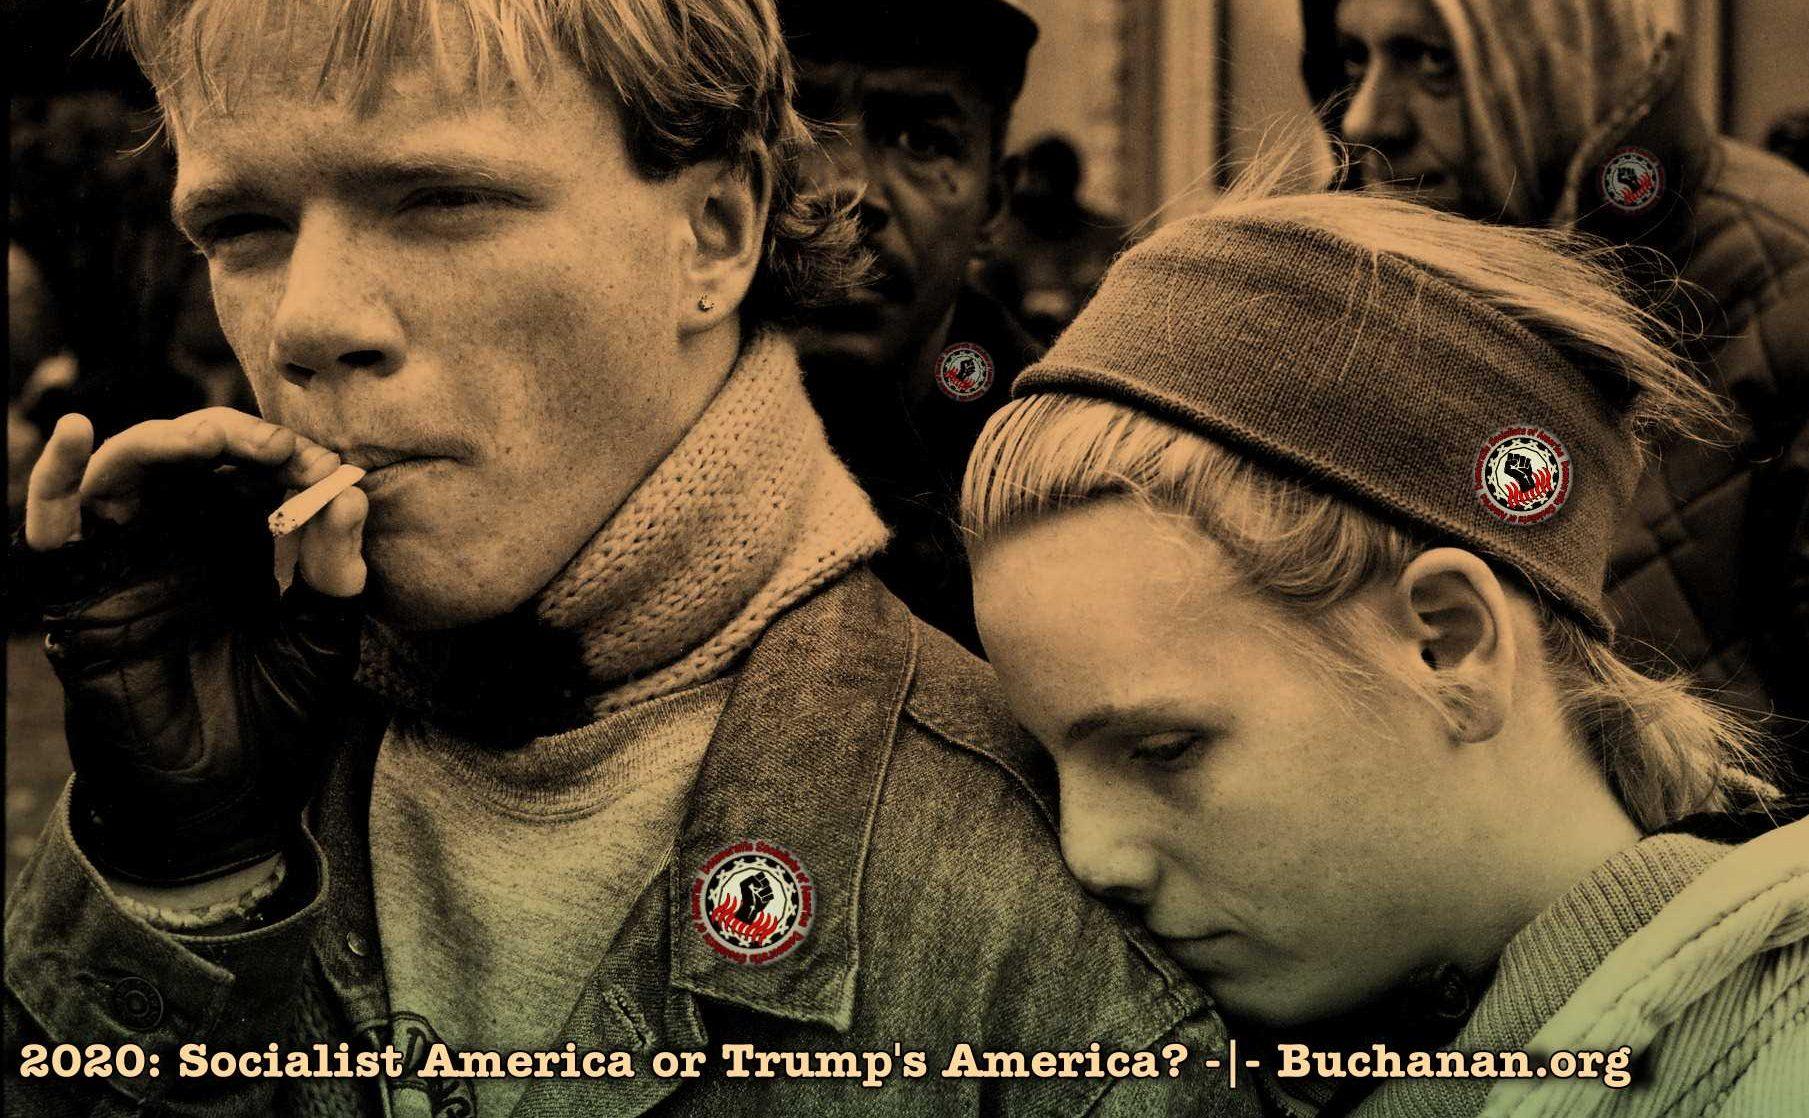 2020: Socialist America or Trump's America?